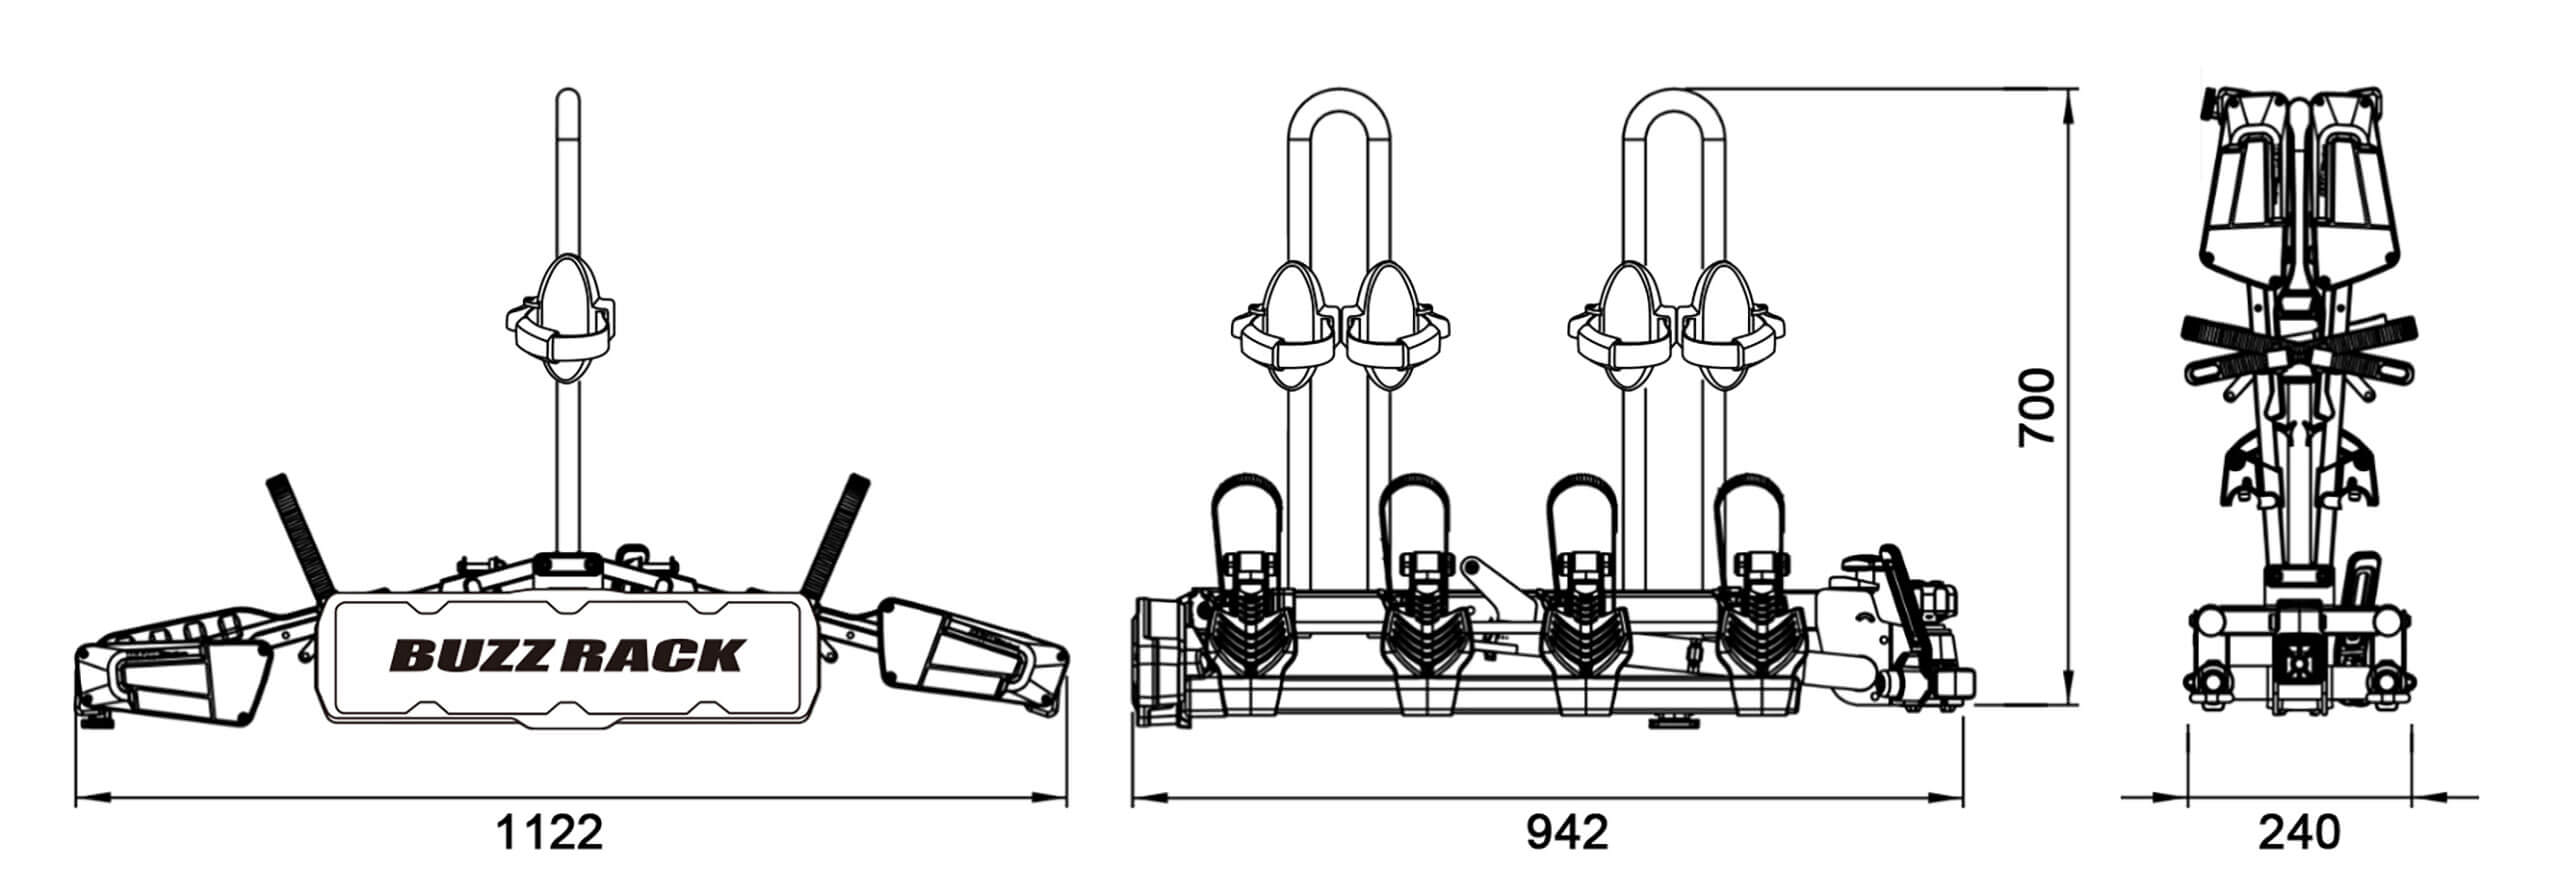 Buzz Rack Eazzy 4 Bike Folding And Tilting Rack No Brp724